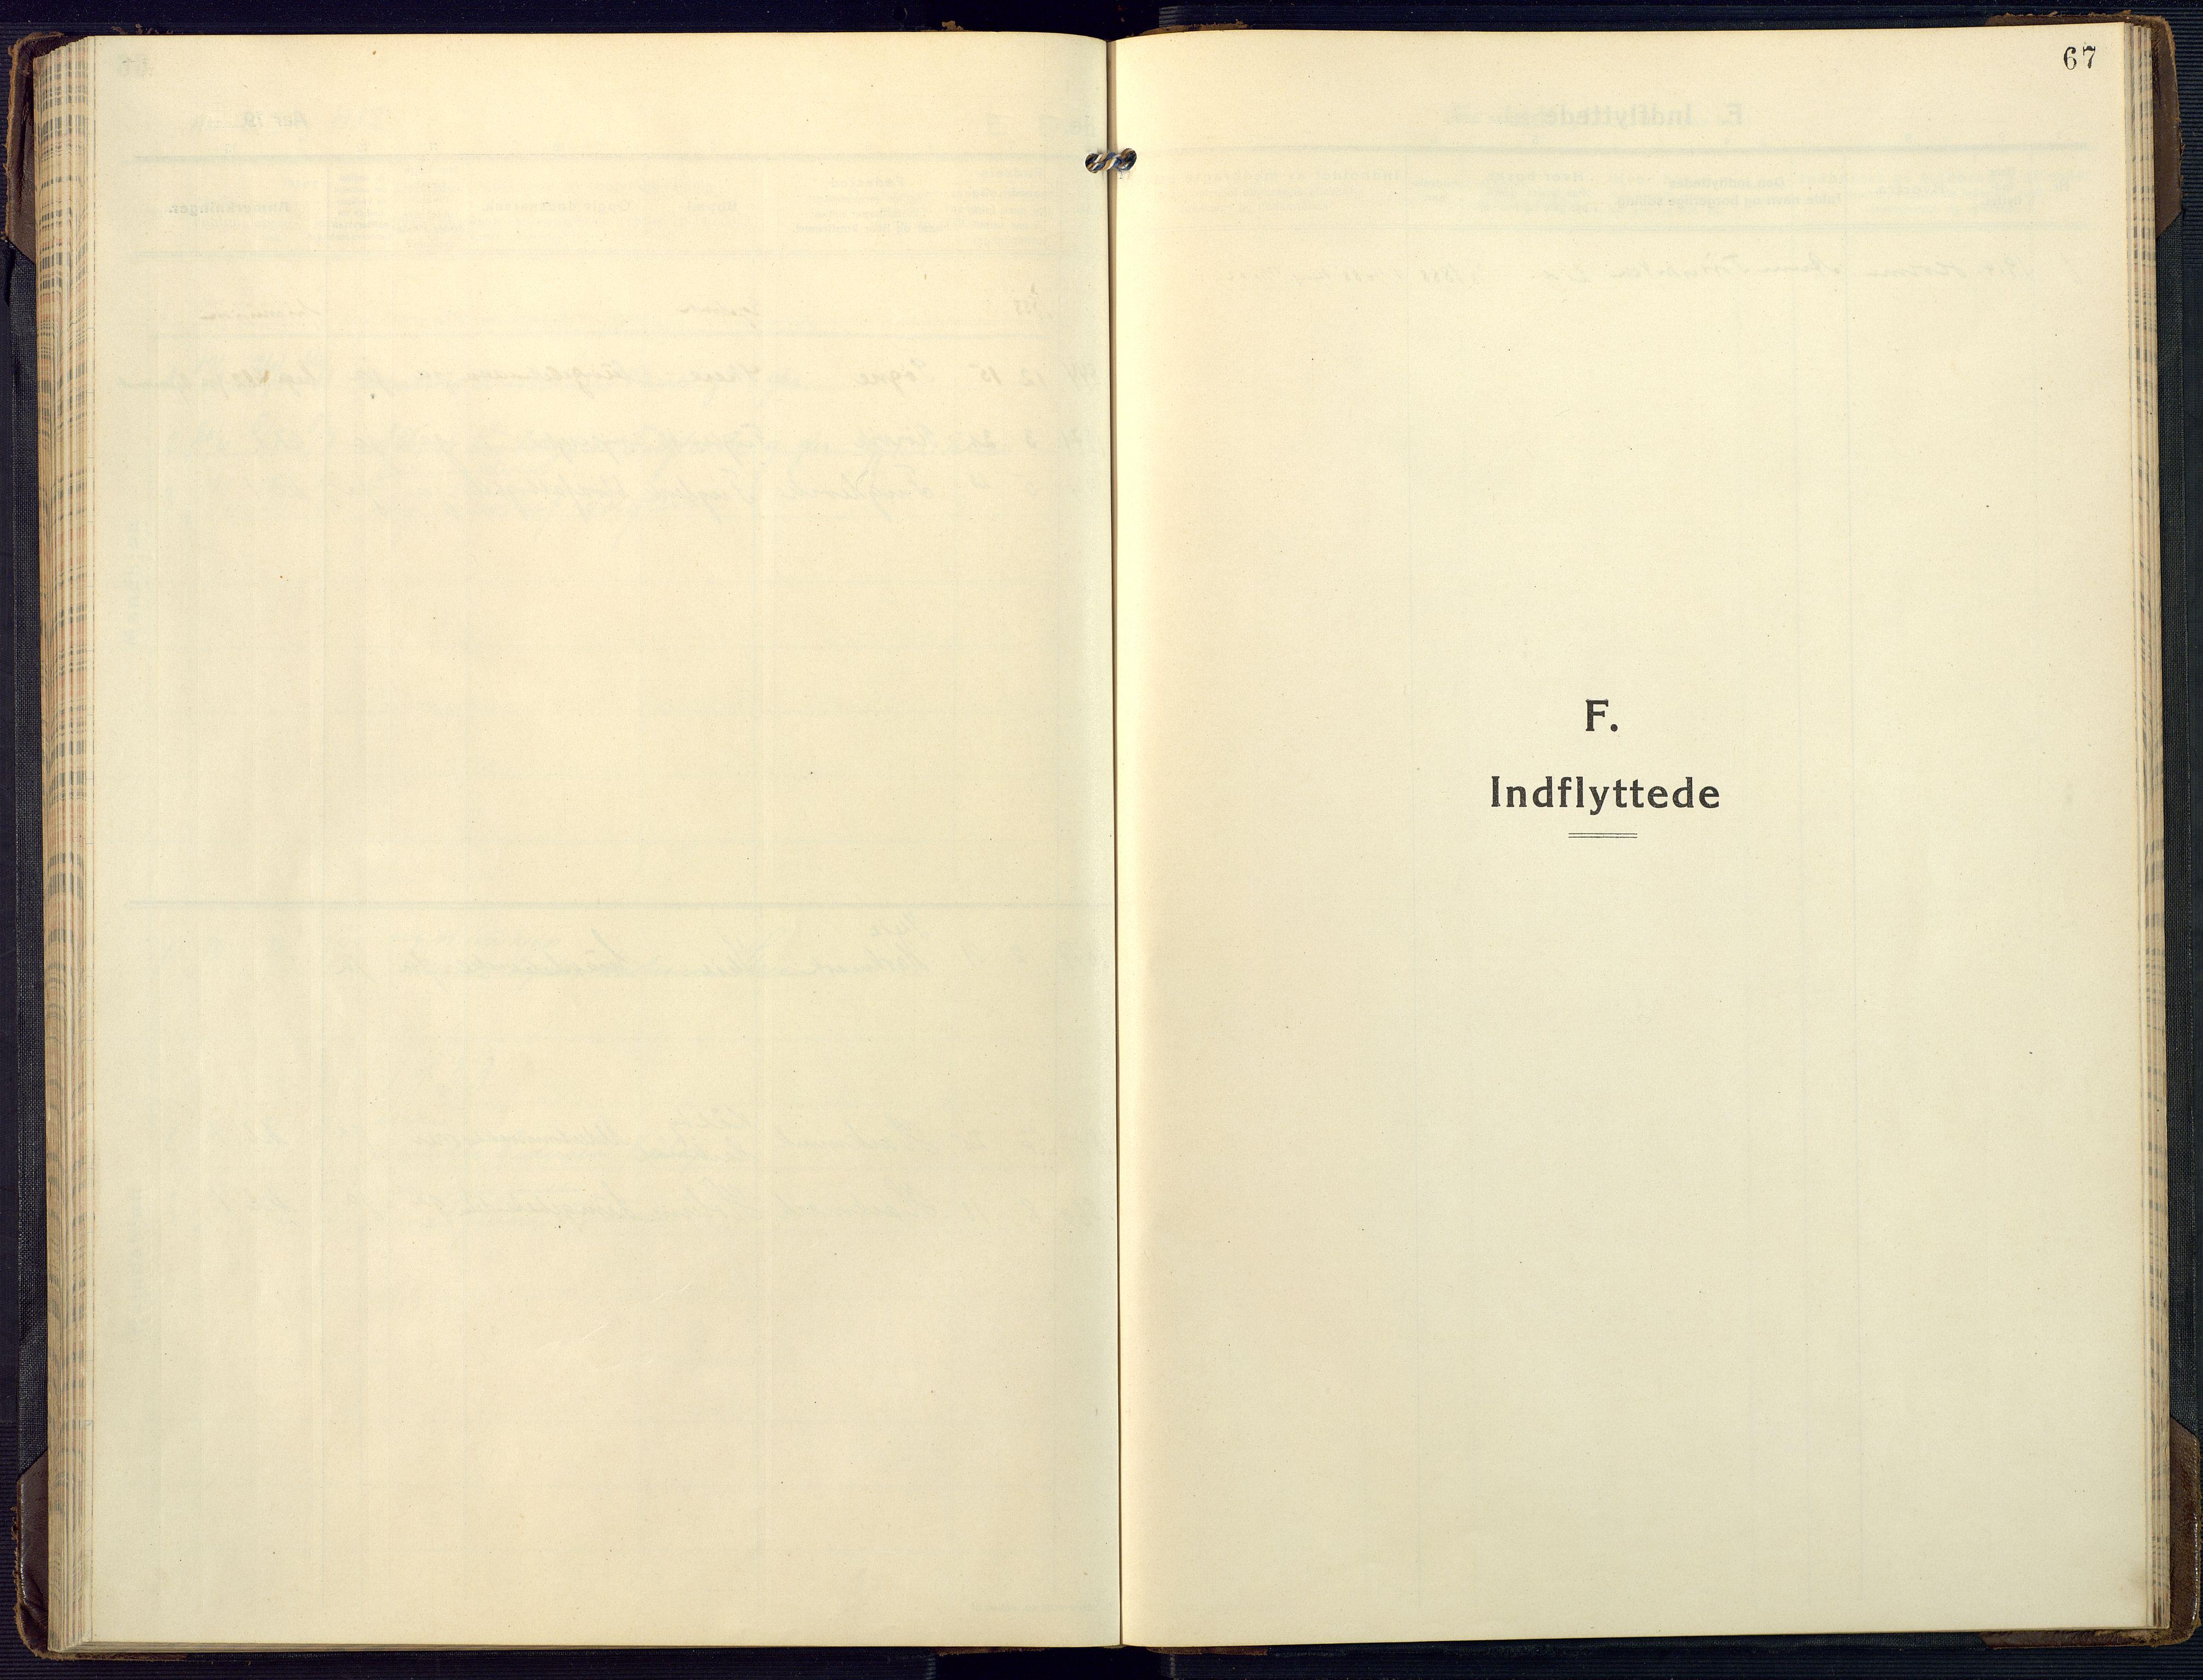 SAK, Mandal sokneprestkontor, F/Fa/Fab/L0003: Ministerialbok nr. A 3, 1913-1933, s. 67